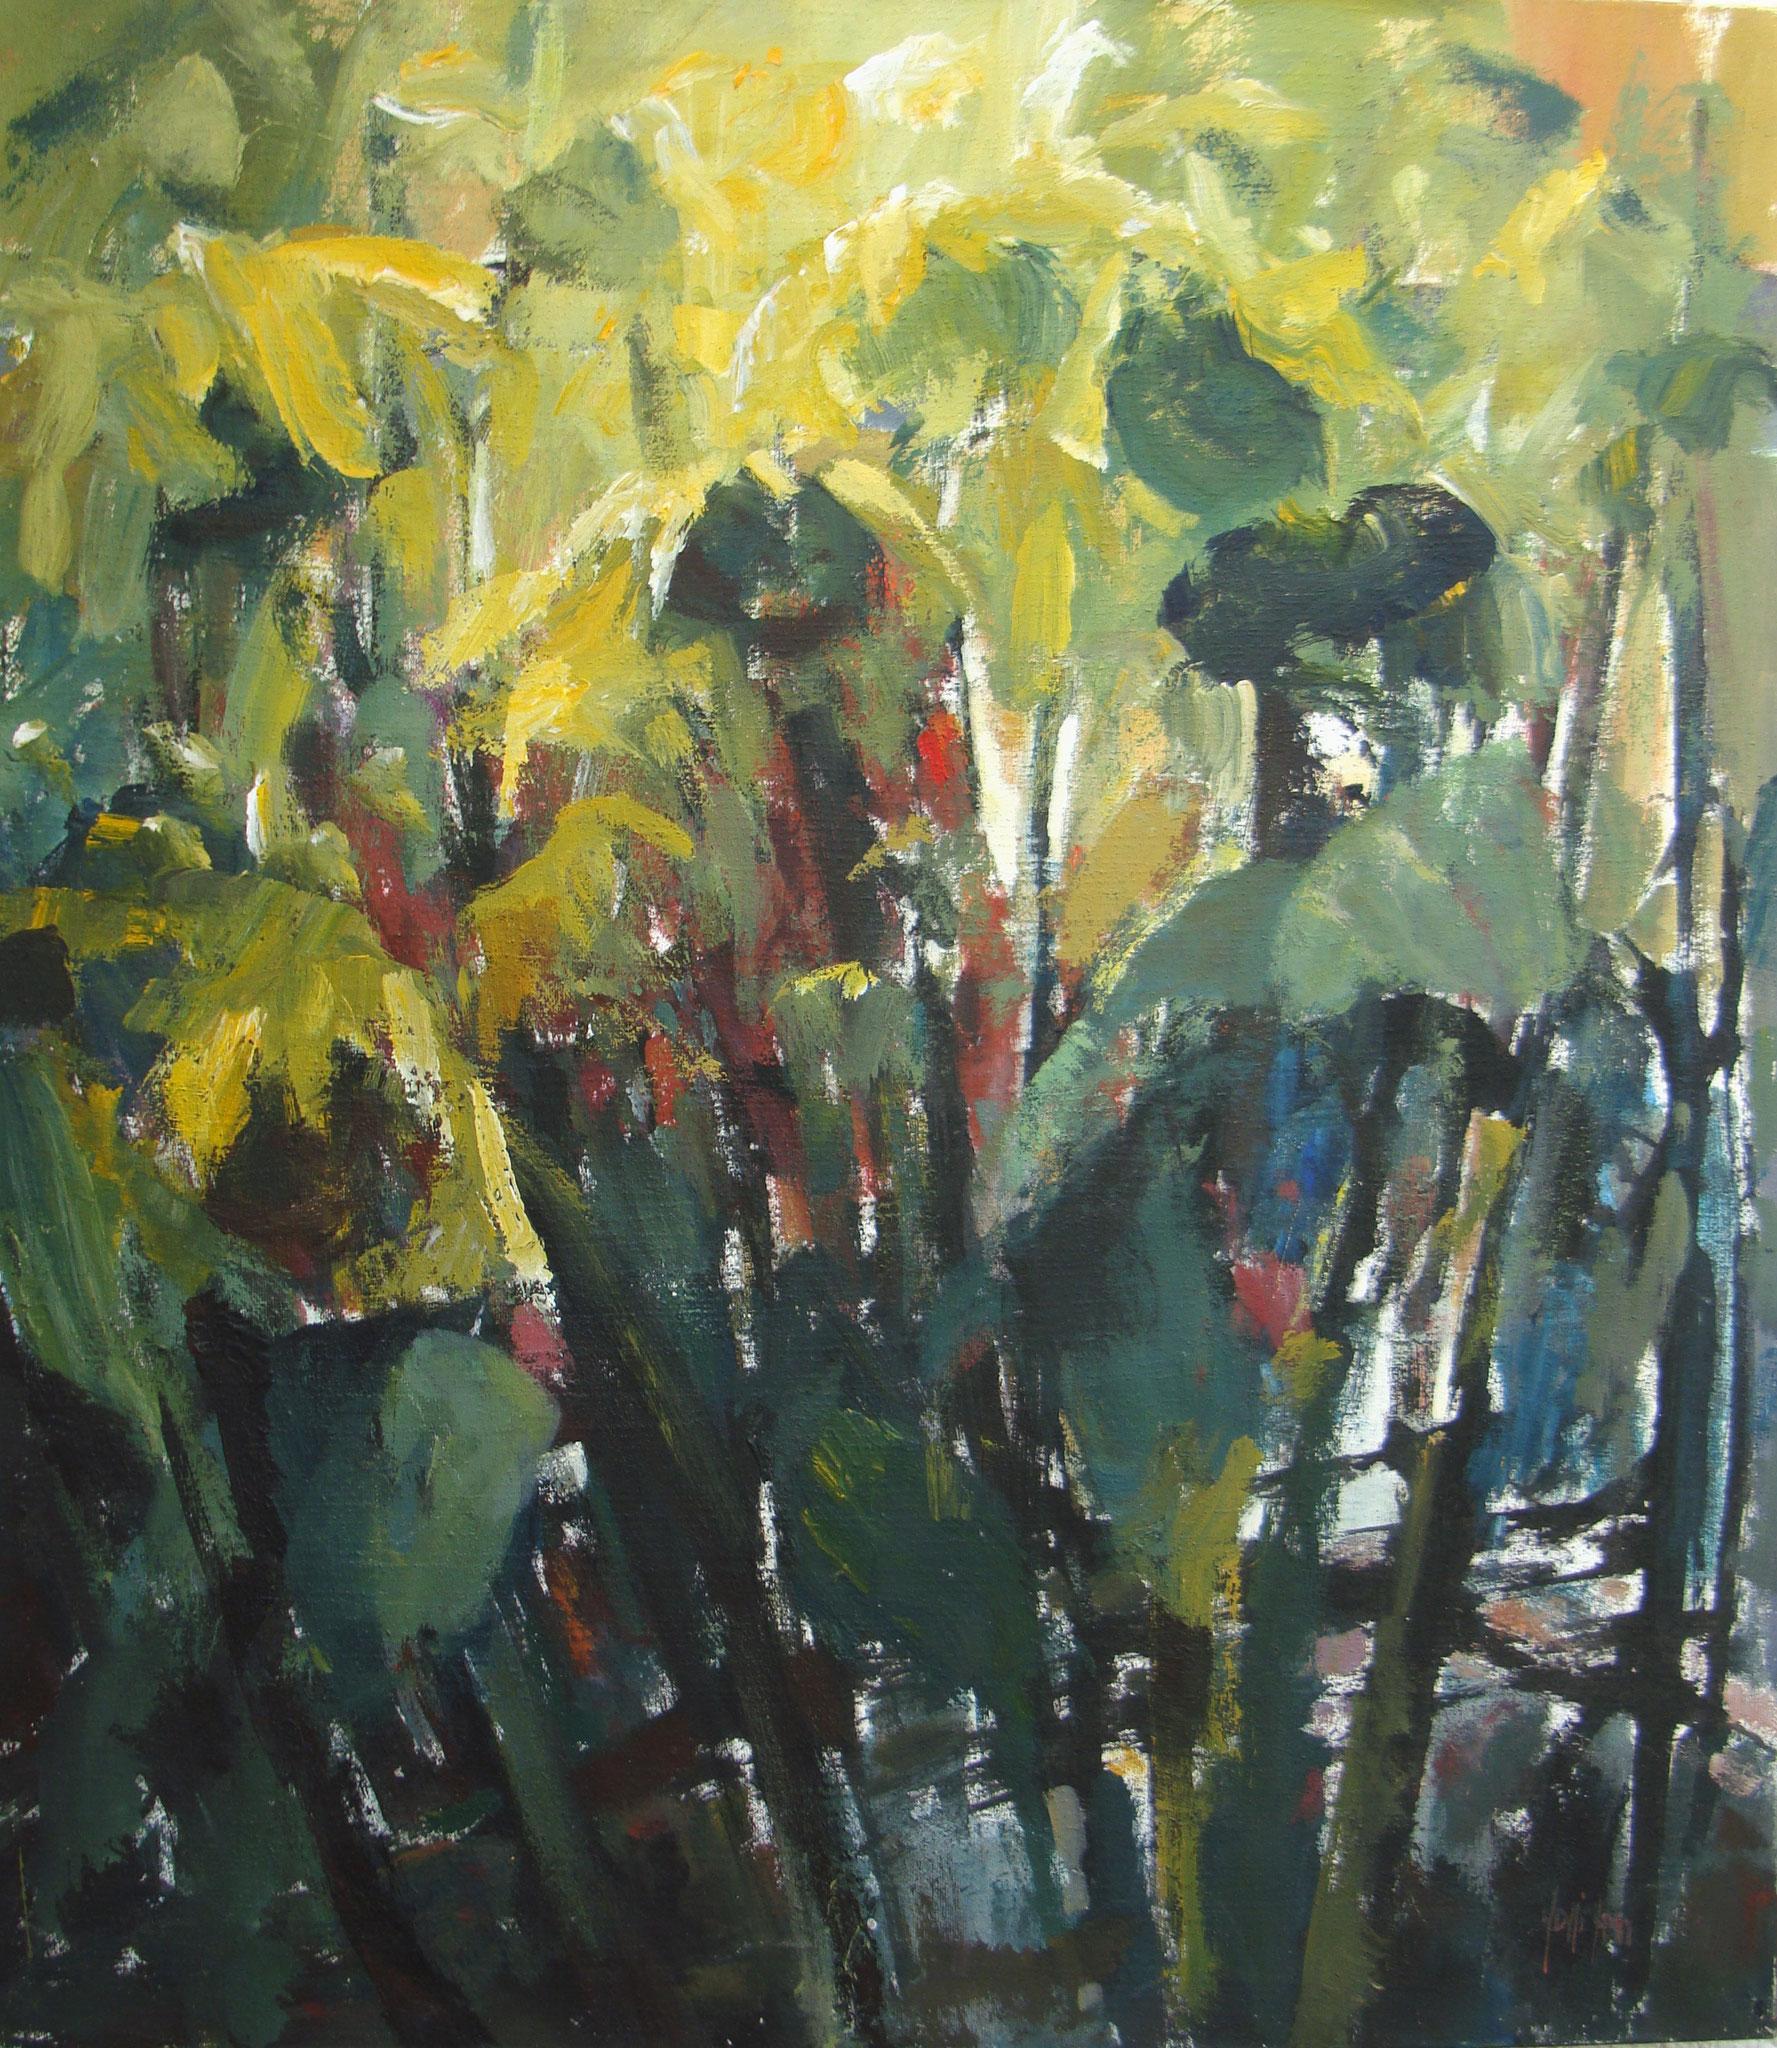 """Sotto il sole"" 1996 - Öl auf Leinwand - 90x80 cm"